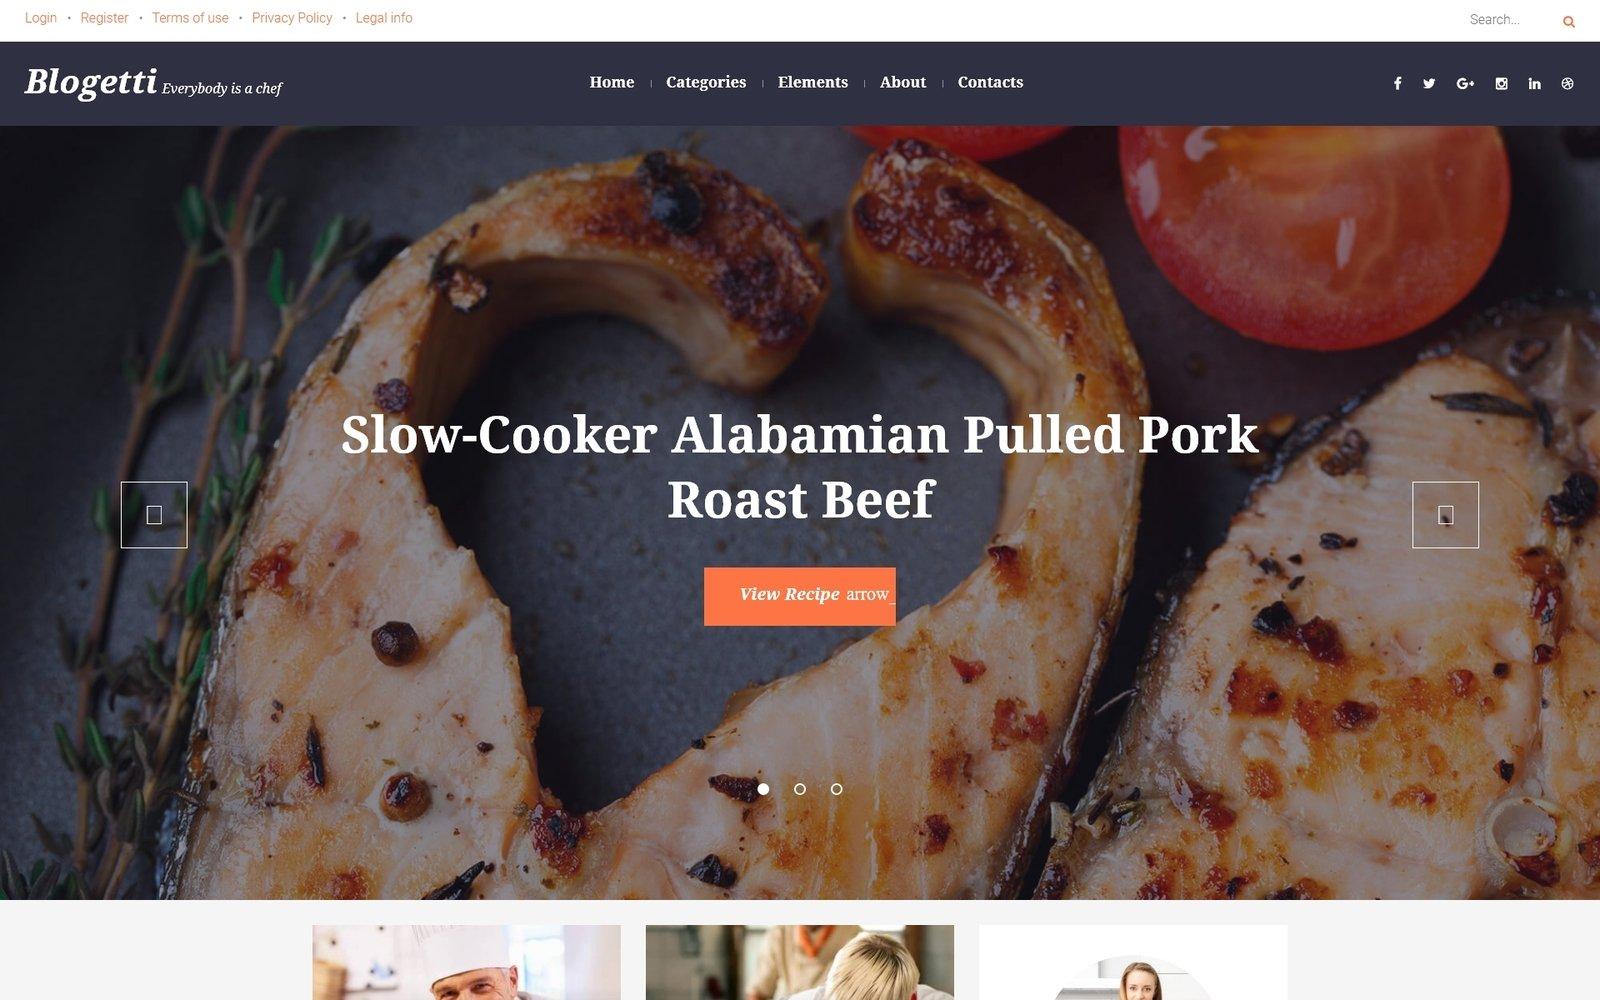 """Blogetti - Restaurant Blog"" - адаптивний WordPress шаблон №58395"